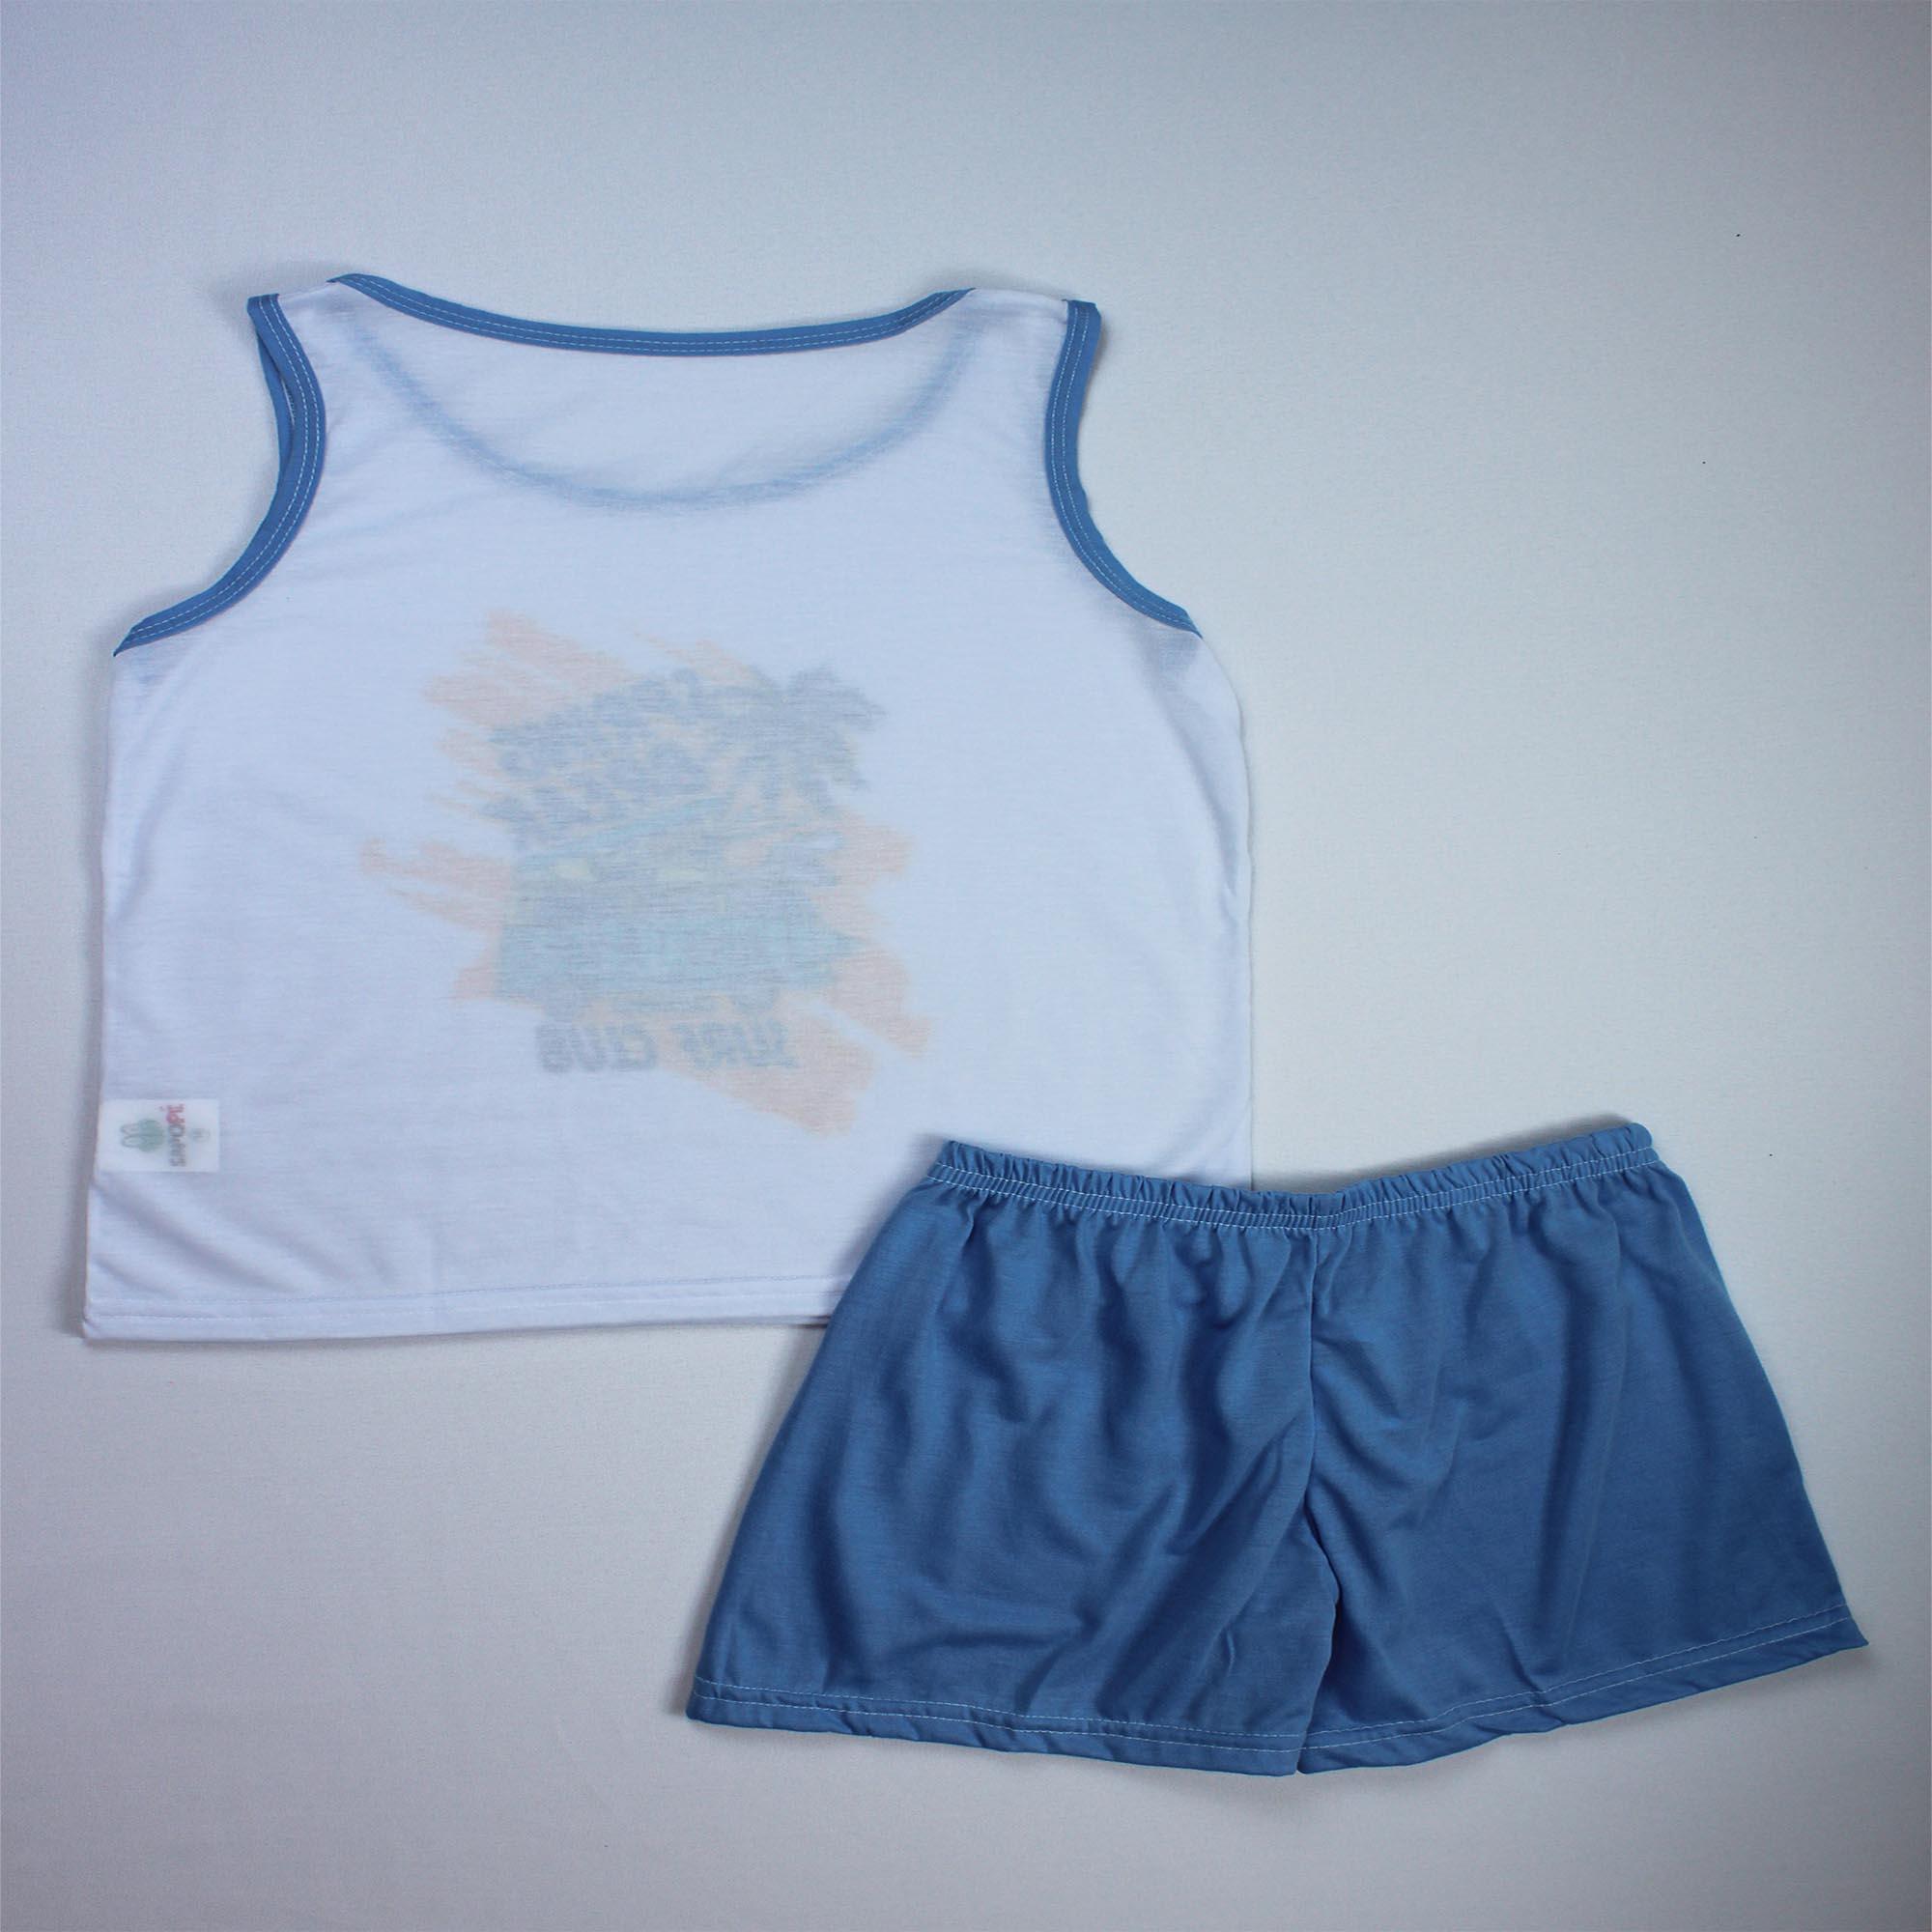 Pijama Regata Infantil Menino - Tamanho 10 e 12